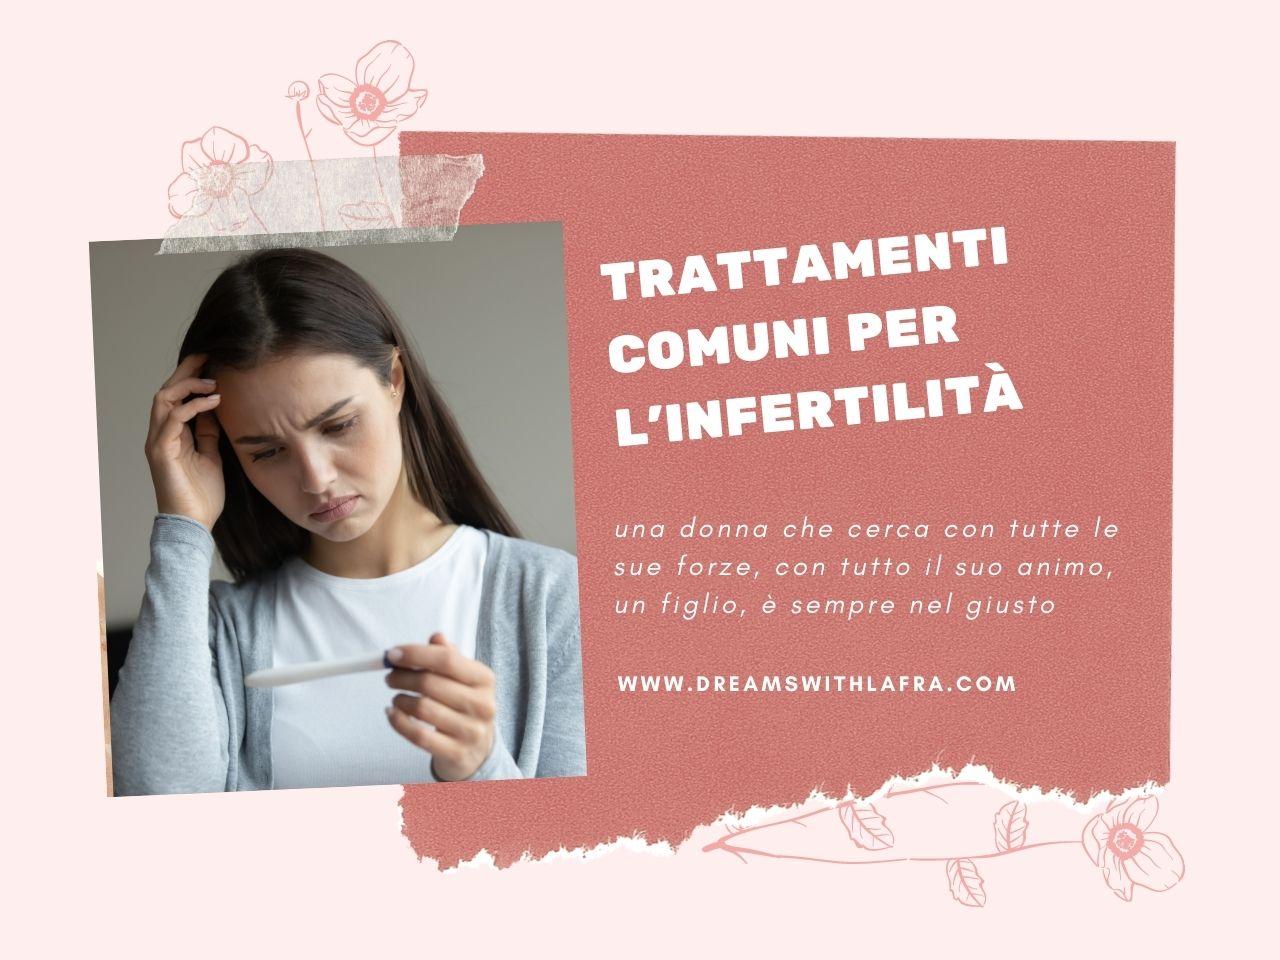 6 trattamenti comuni per l'infertilità